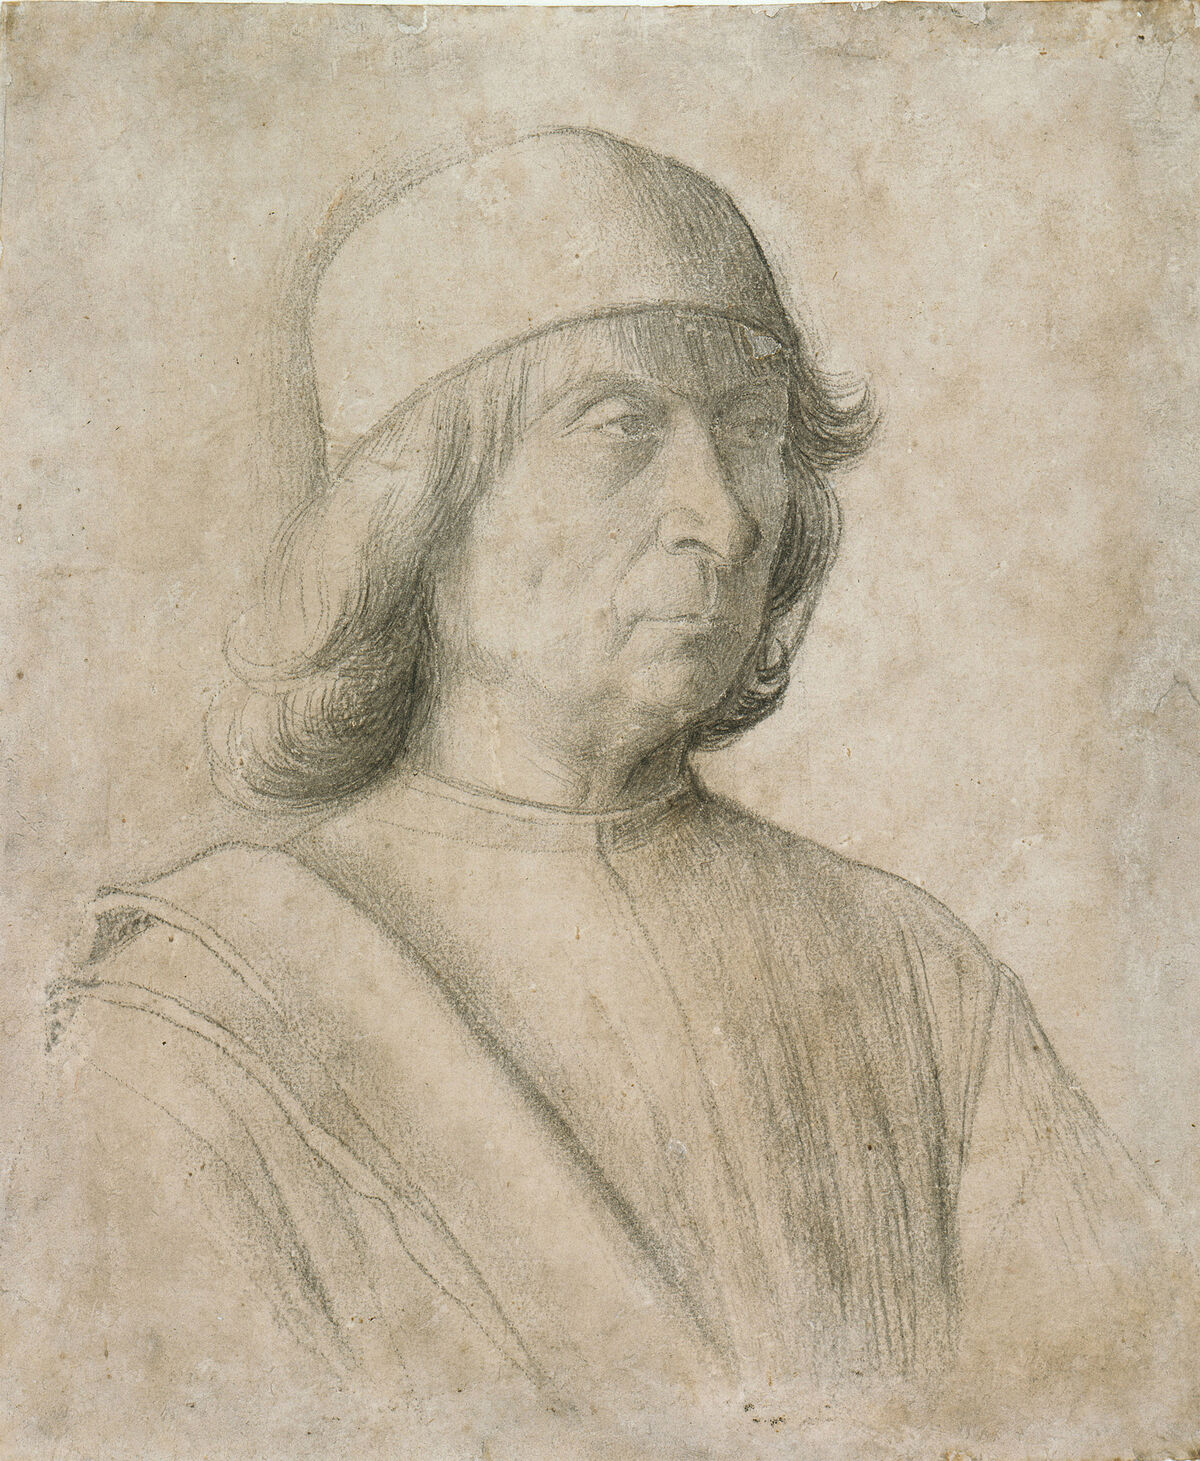 Gentile Bellini, Self-Portrait, c. 1496-97. Photo via Wikimedia Commons.